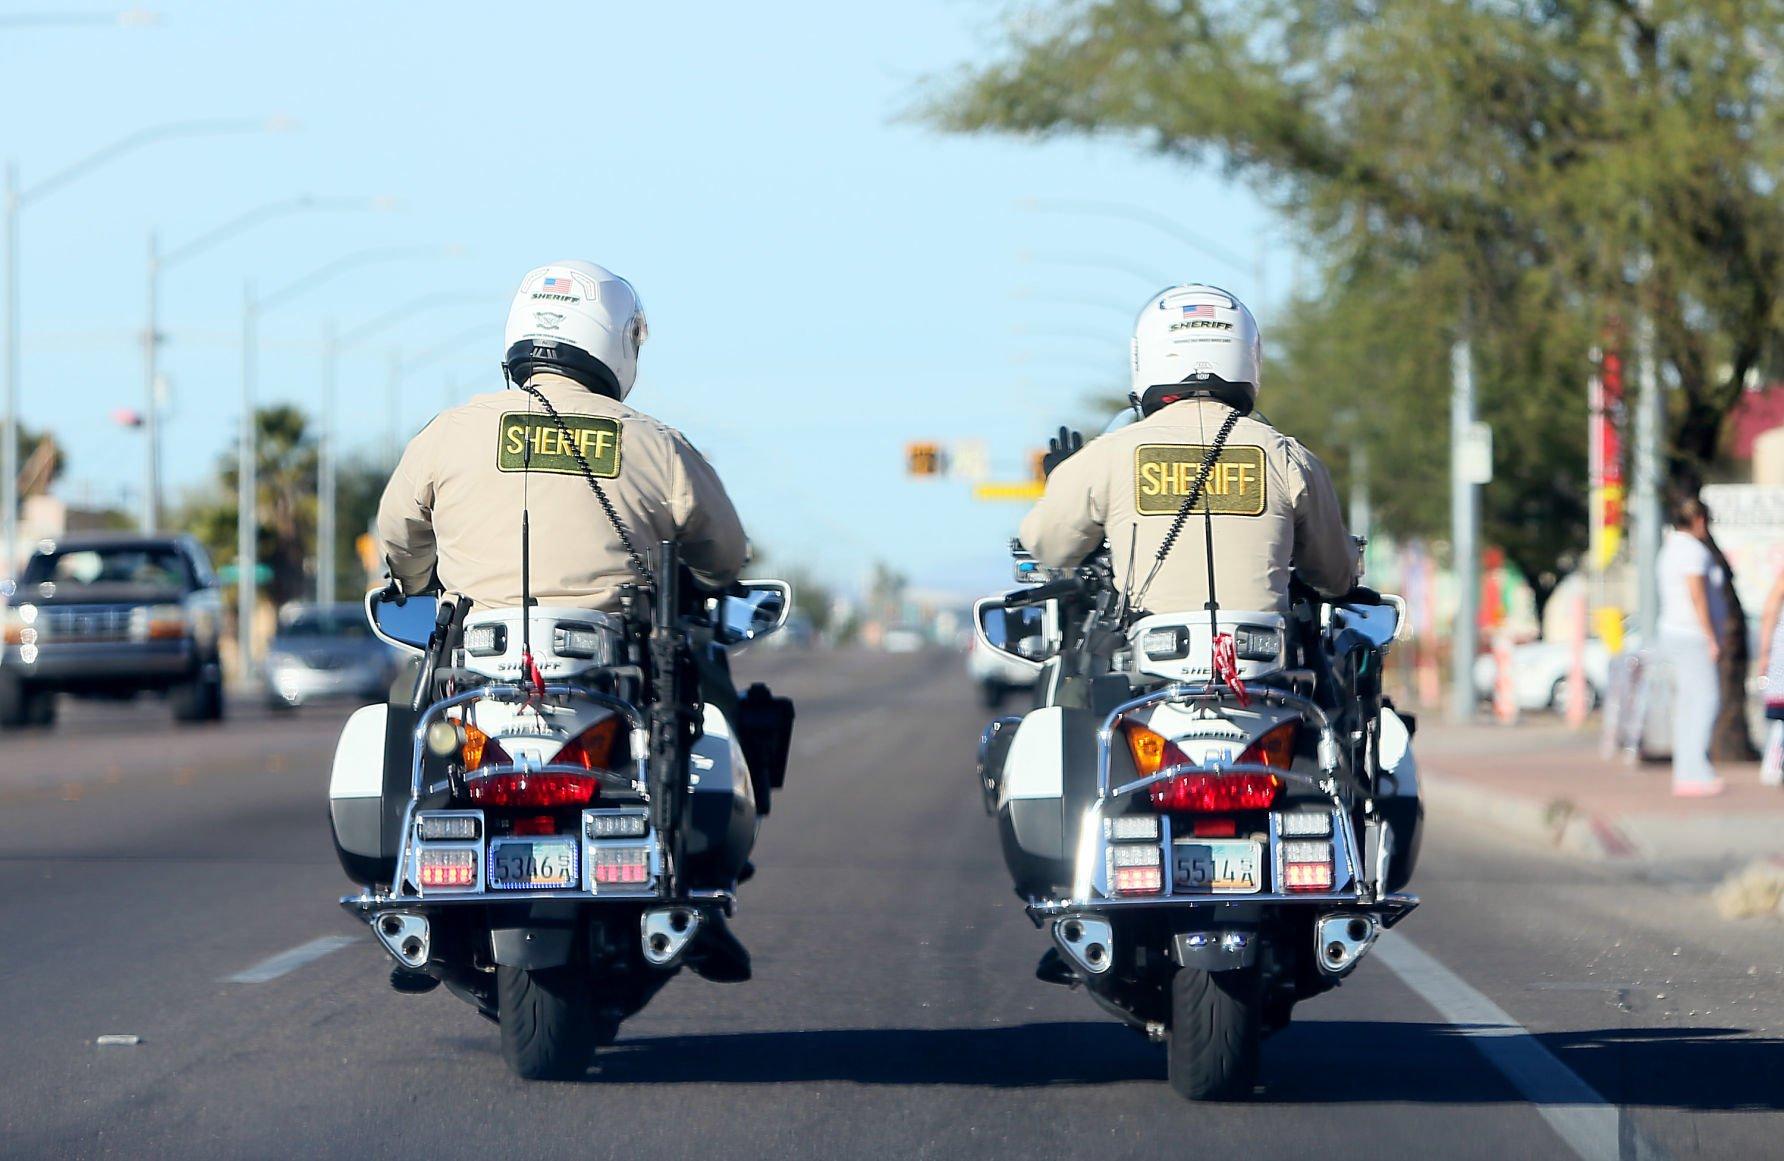 pima county sheriff incident report - Ataum berglauf-verband com